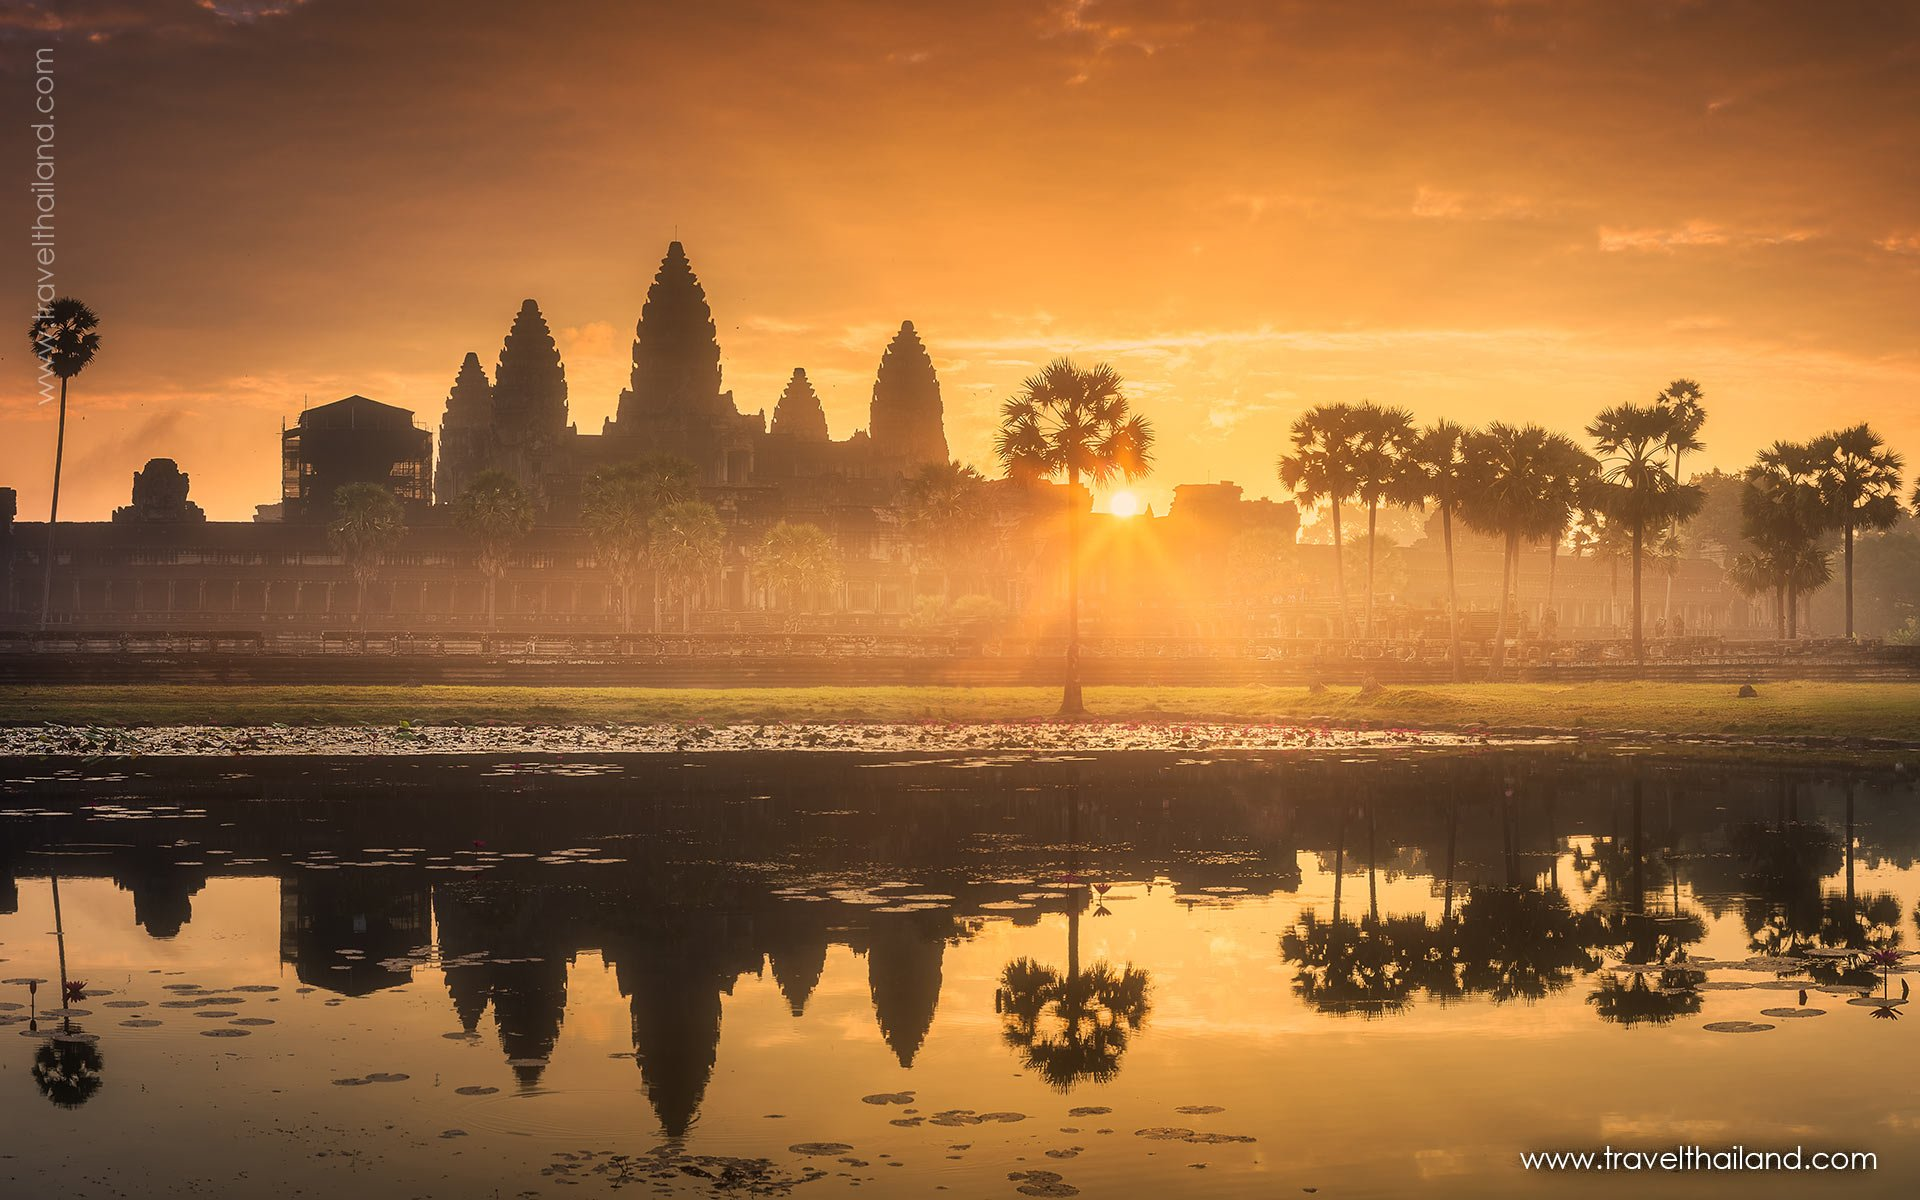 The Magic & Mystery of Bangkok & Siem Reap - 6 days